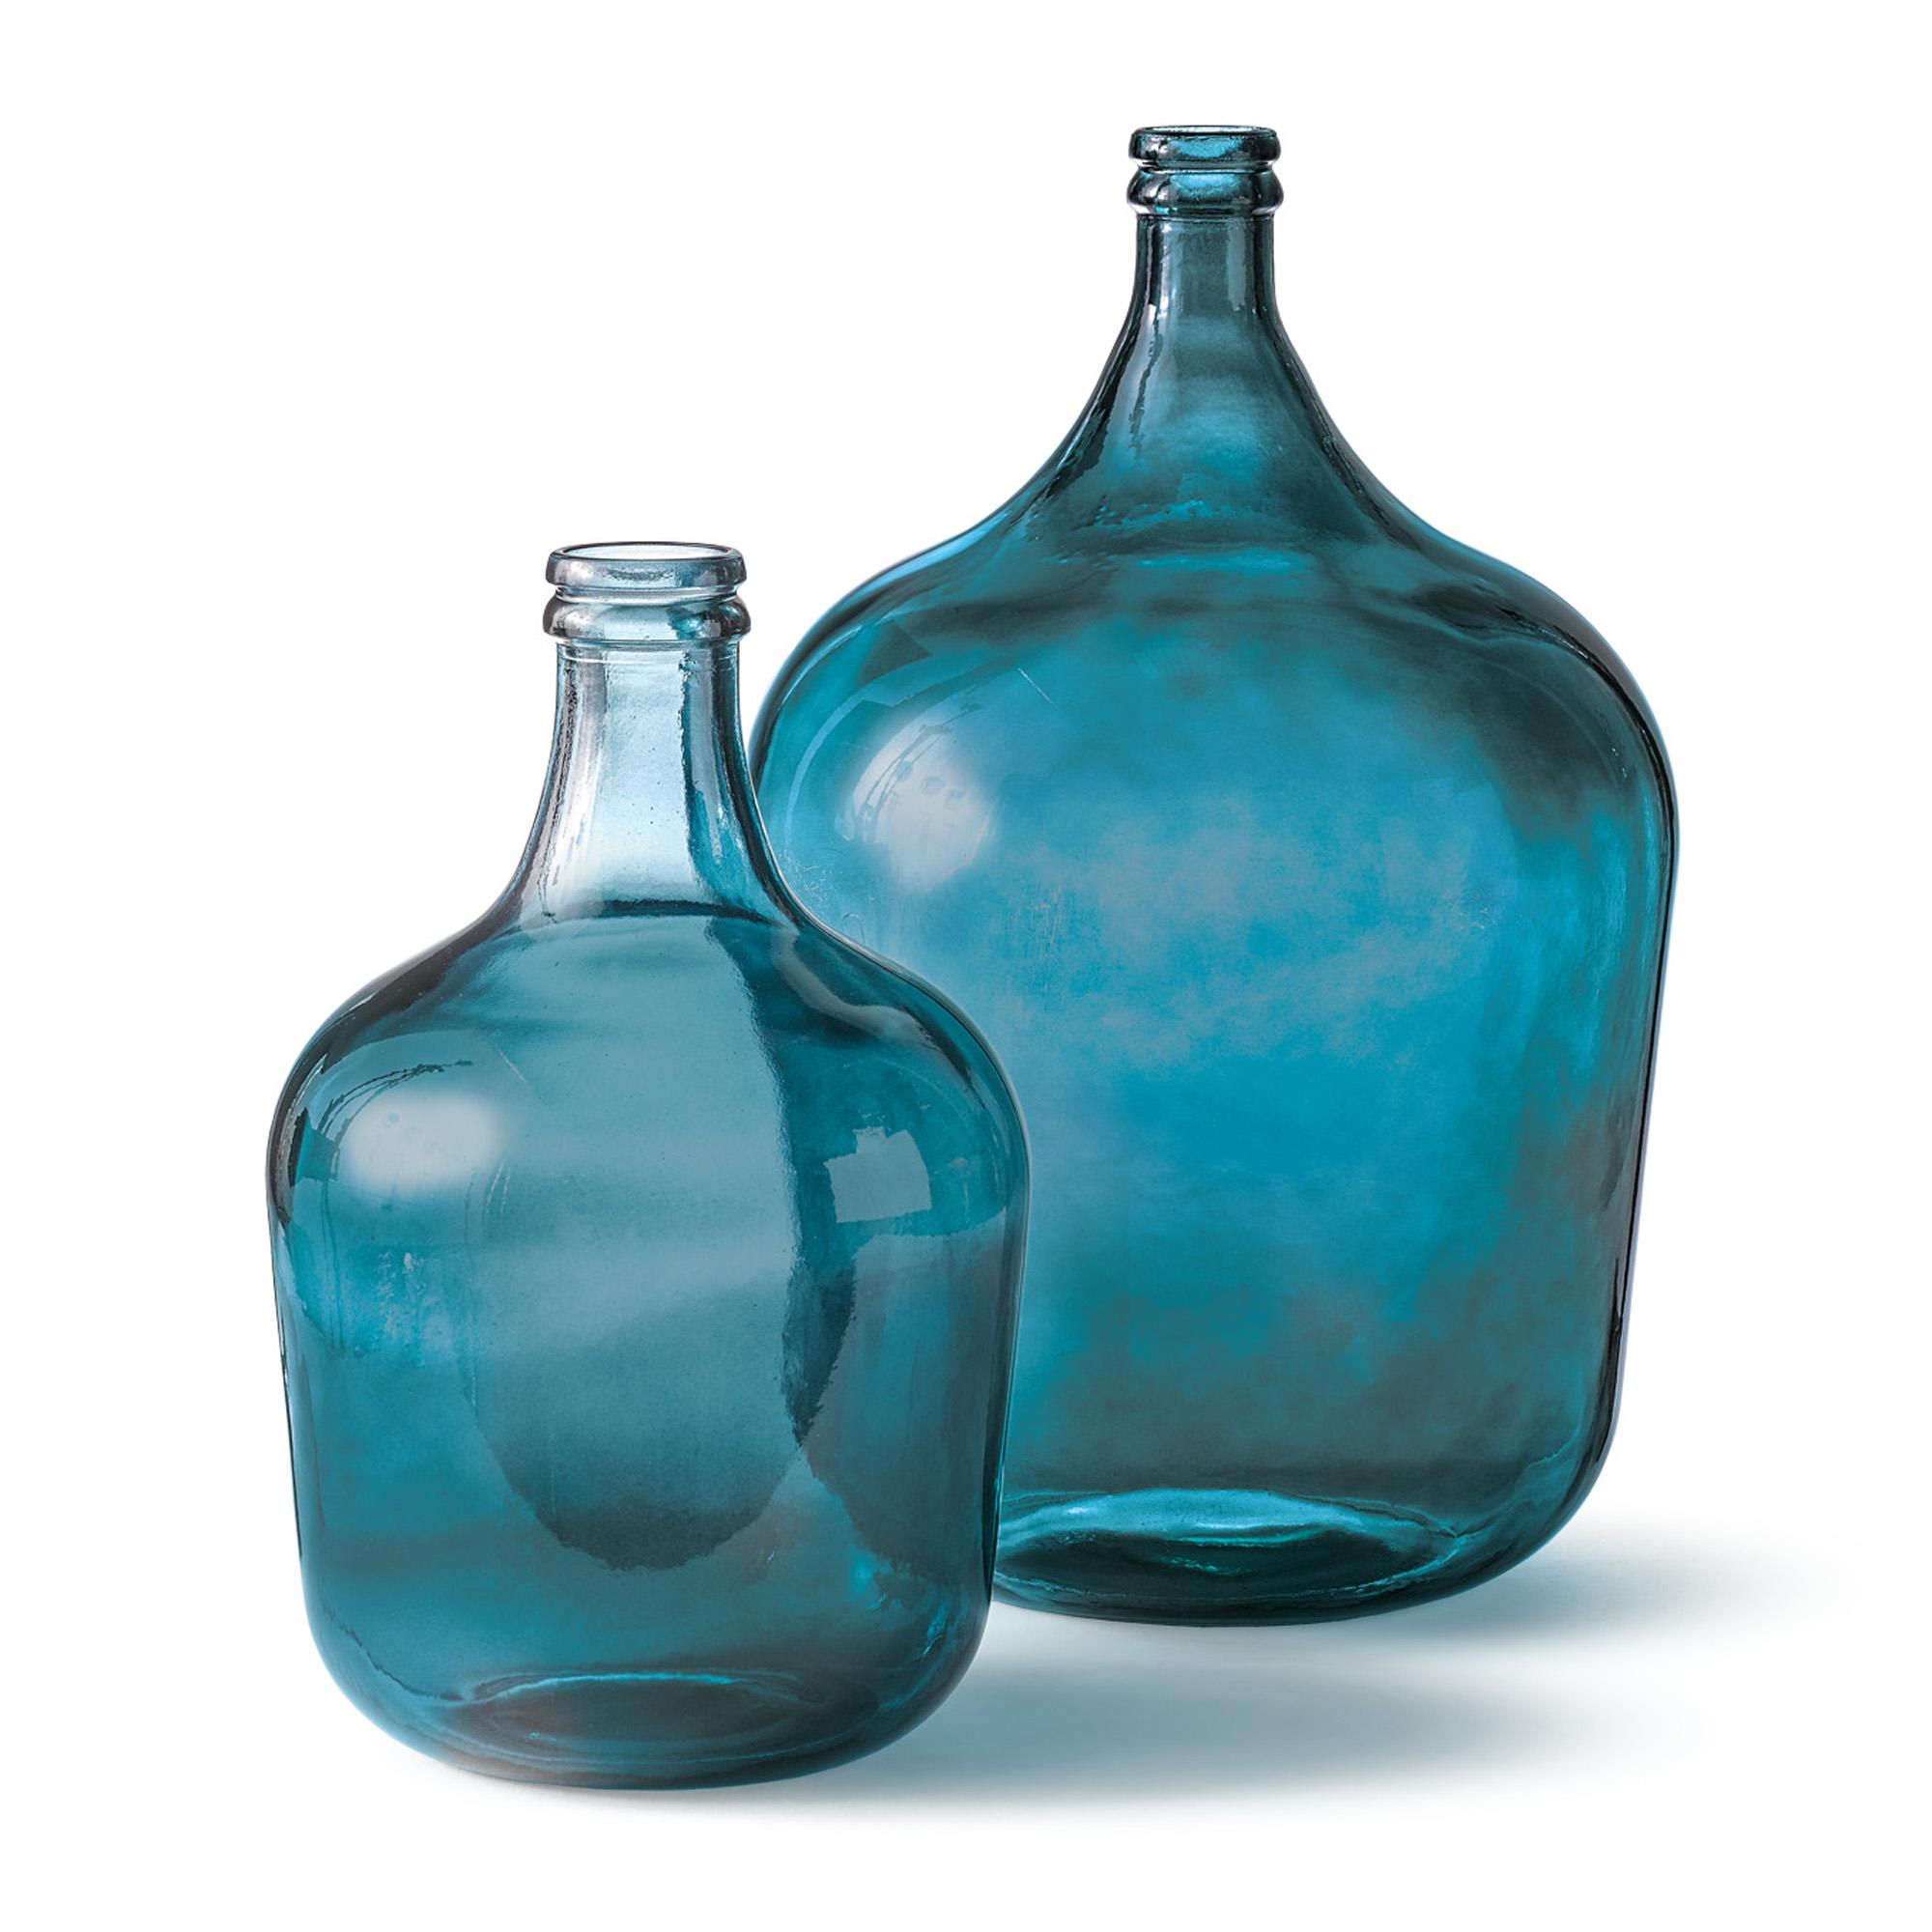 Farmhouse French Blue Glass Bottles | Gump's